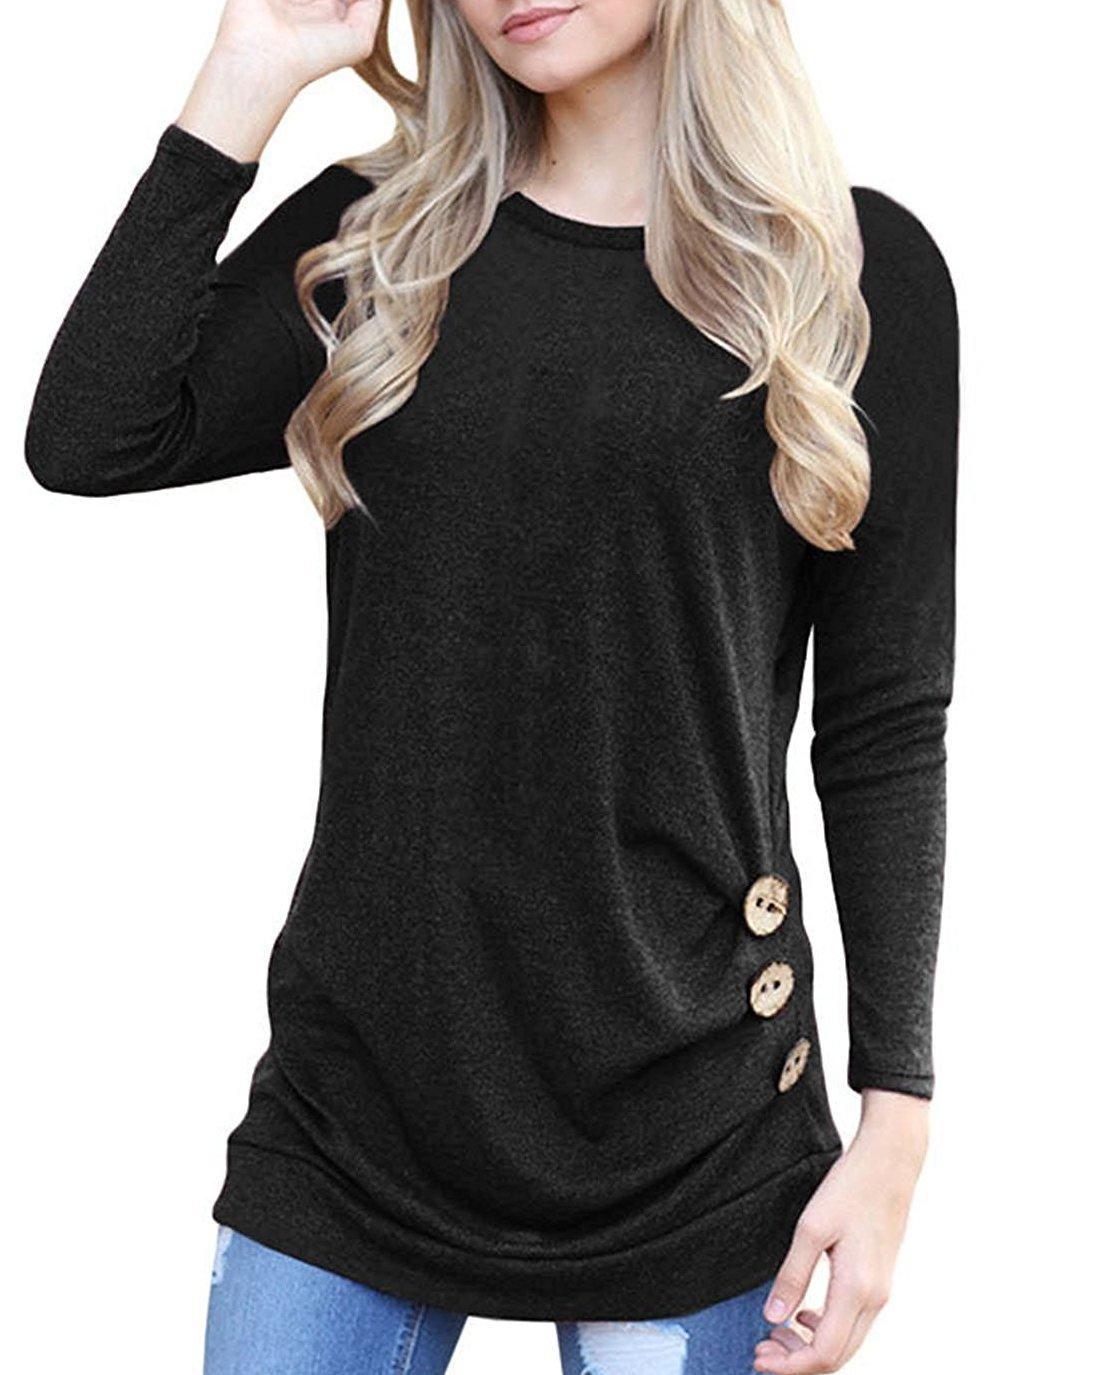 Doris Kids Women's Casual Tunic Top Sweatshirt Long Sleeve Blouse T-Shirt Button Decor Black M